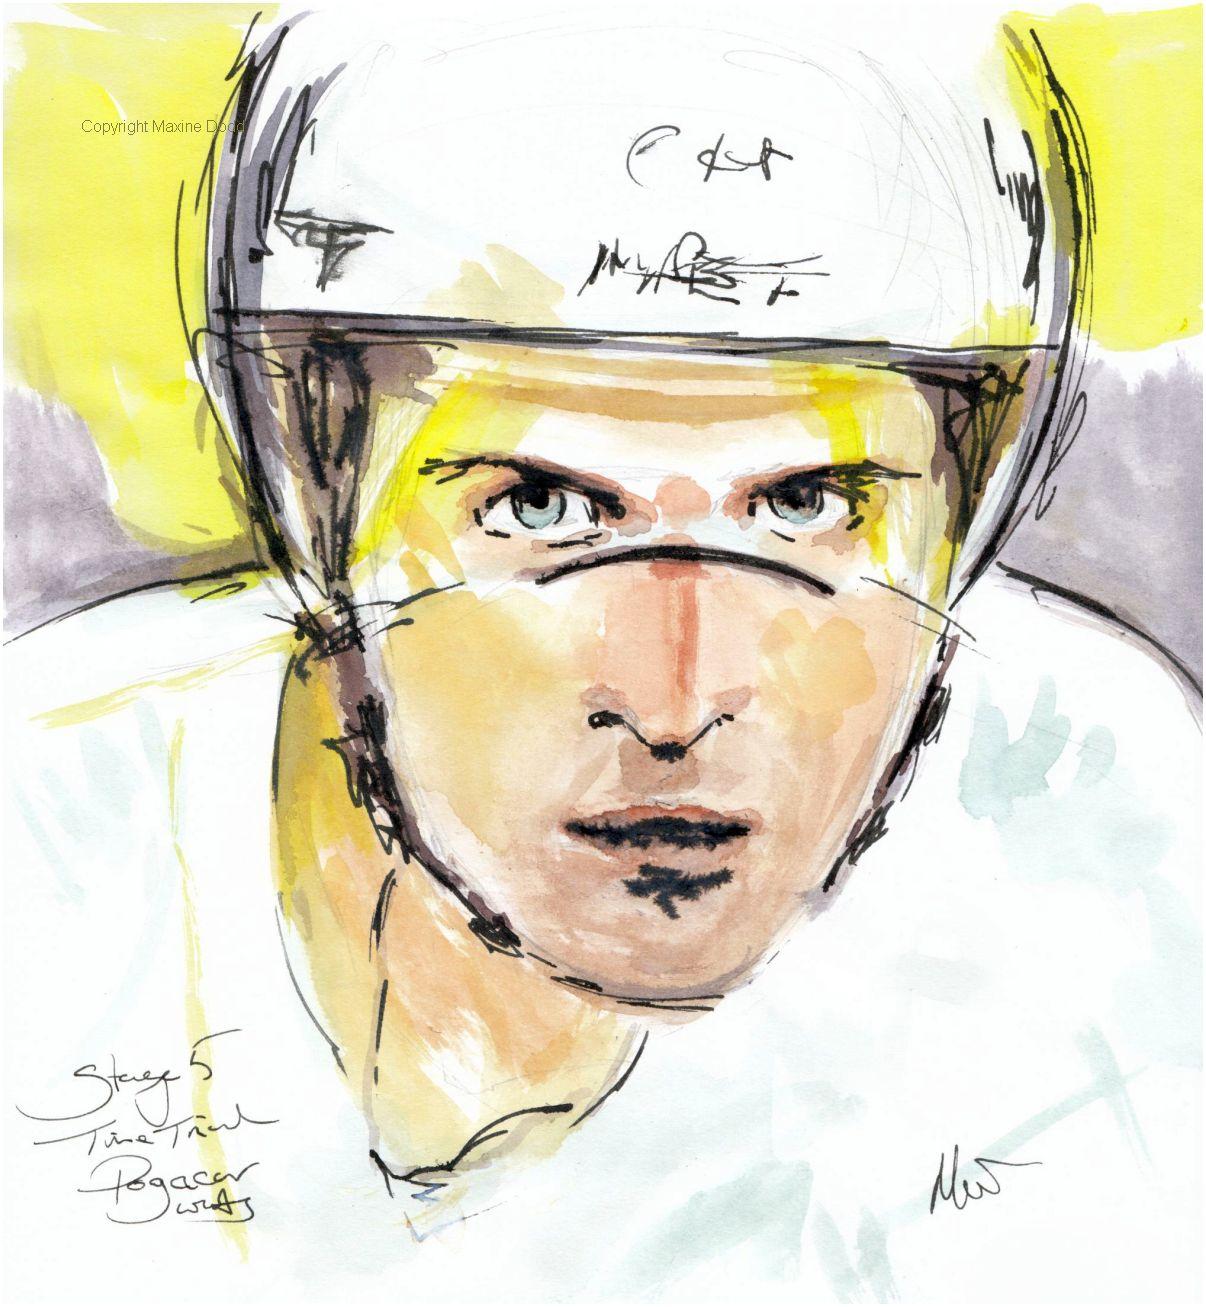 Tour de France 2021 - Stage 5, Pogačar waits, original watercolour painting Maxine Dodd